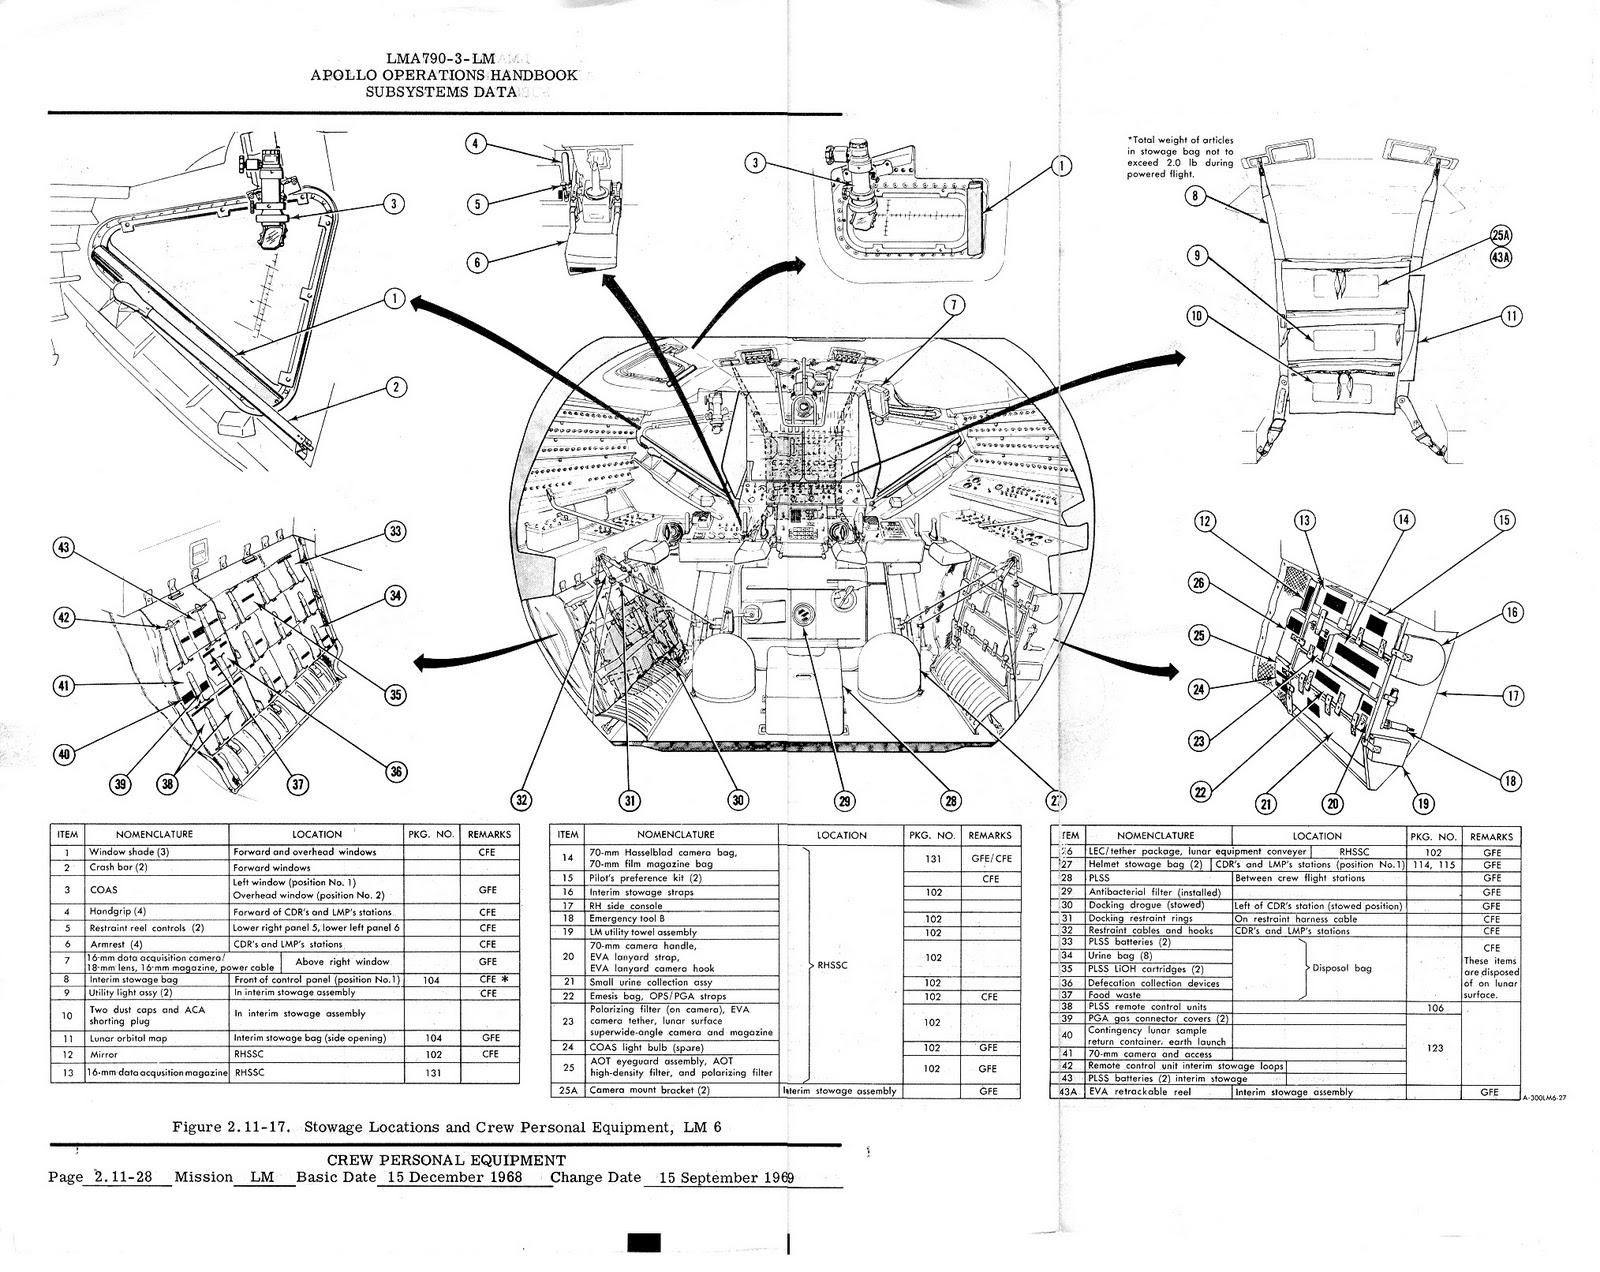 The Spin Brothers: Manual do Programa Apollo